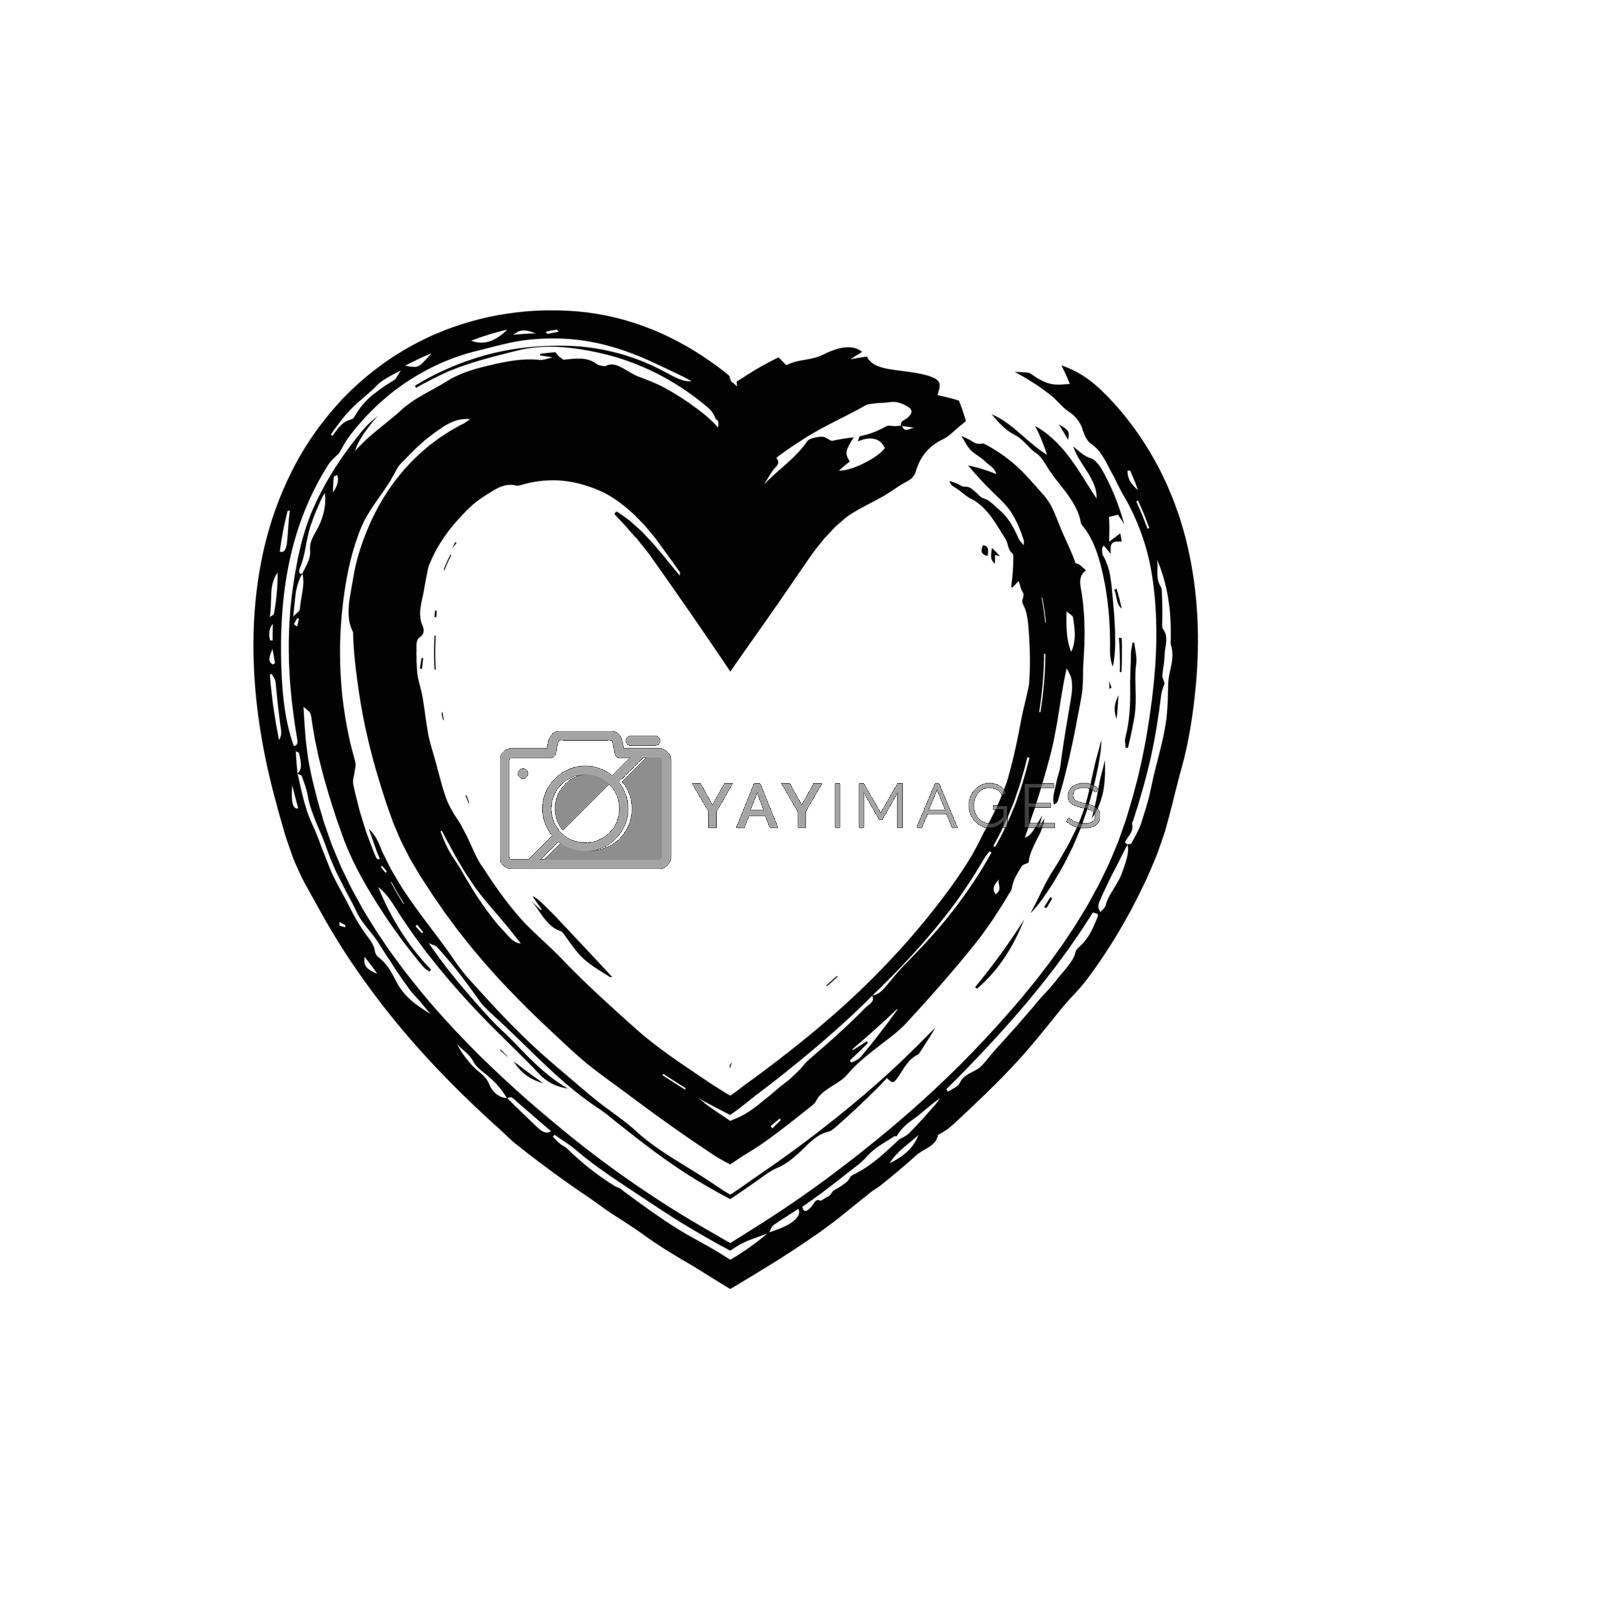 heart shape symbol love vector black. Heart symbol wedding and Valentine day. Heart black outline frame.